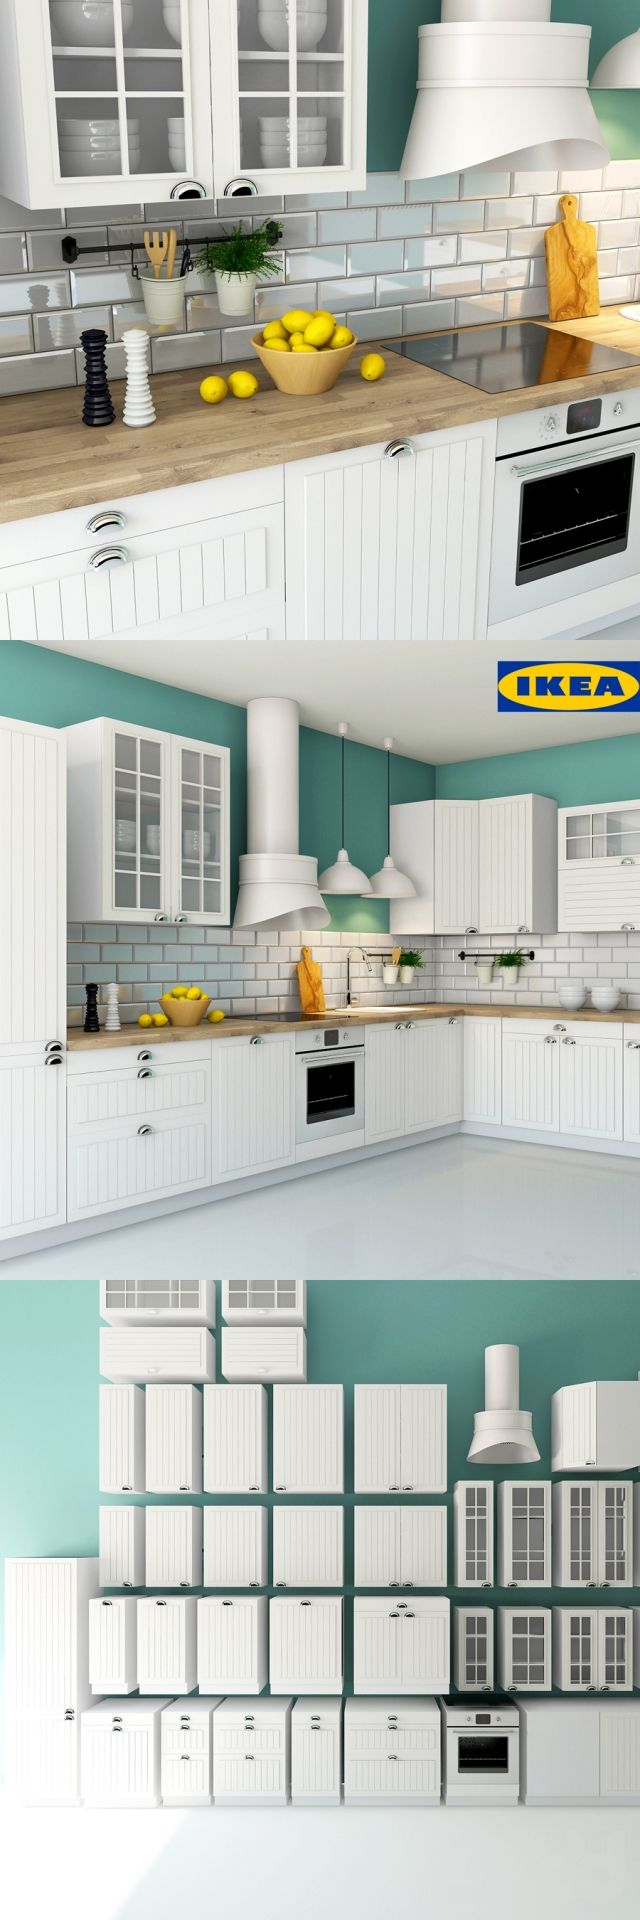 Ikea Stat Faktum Cocinas Pinterest  # Muebles Cocina Ikea Faktum